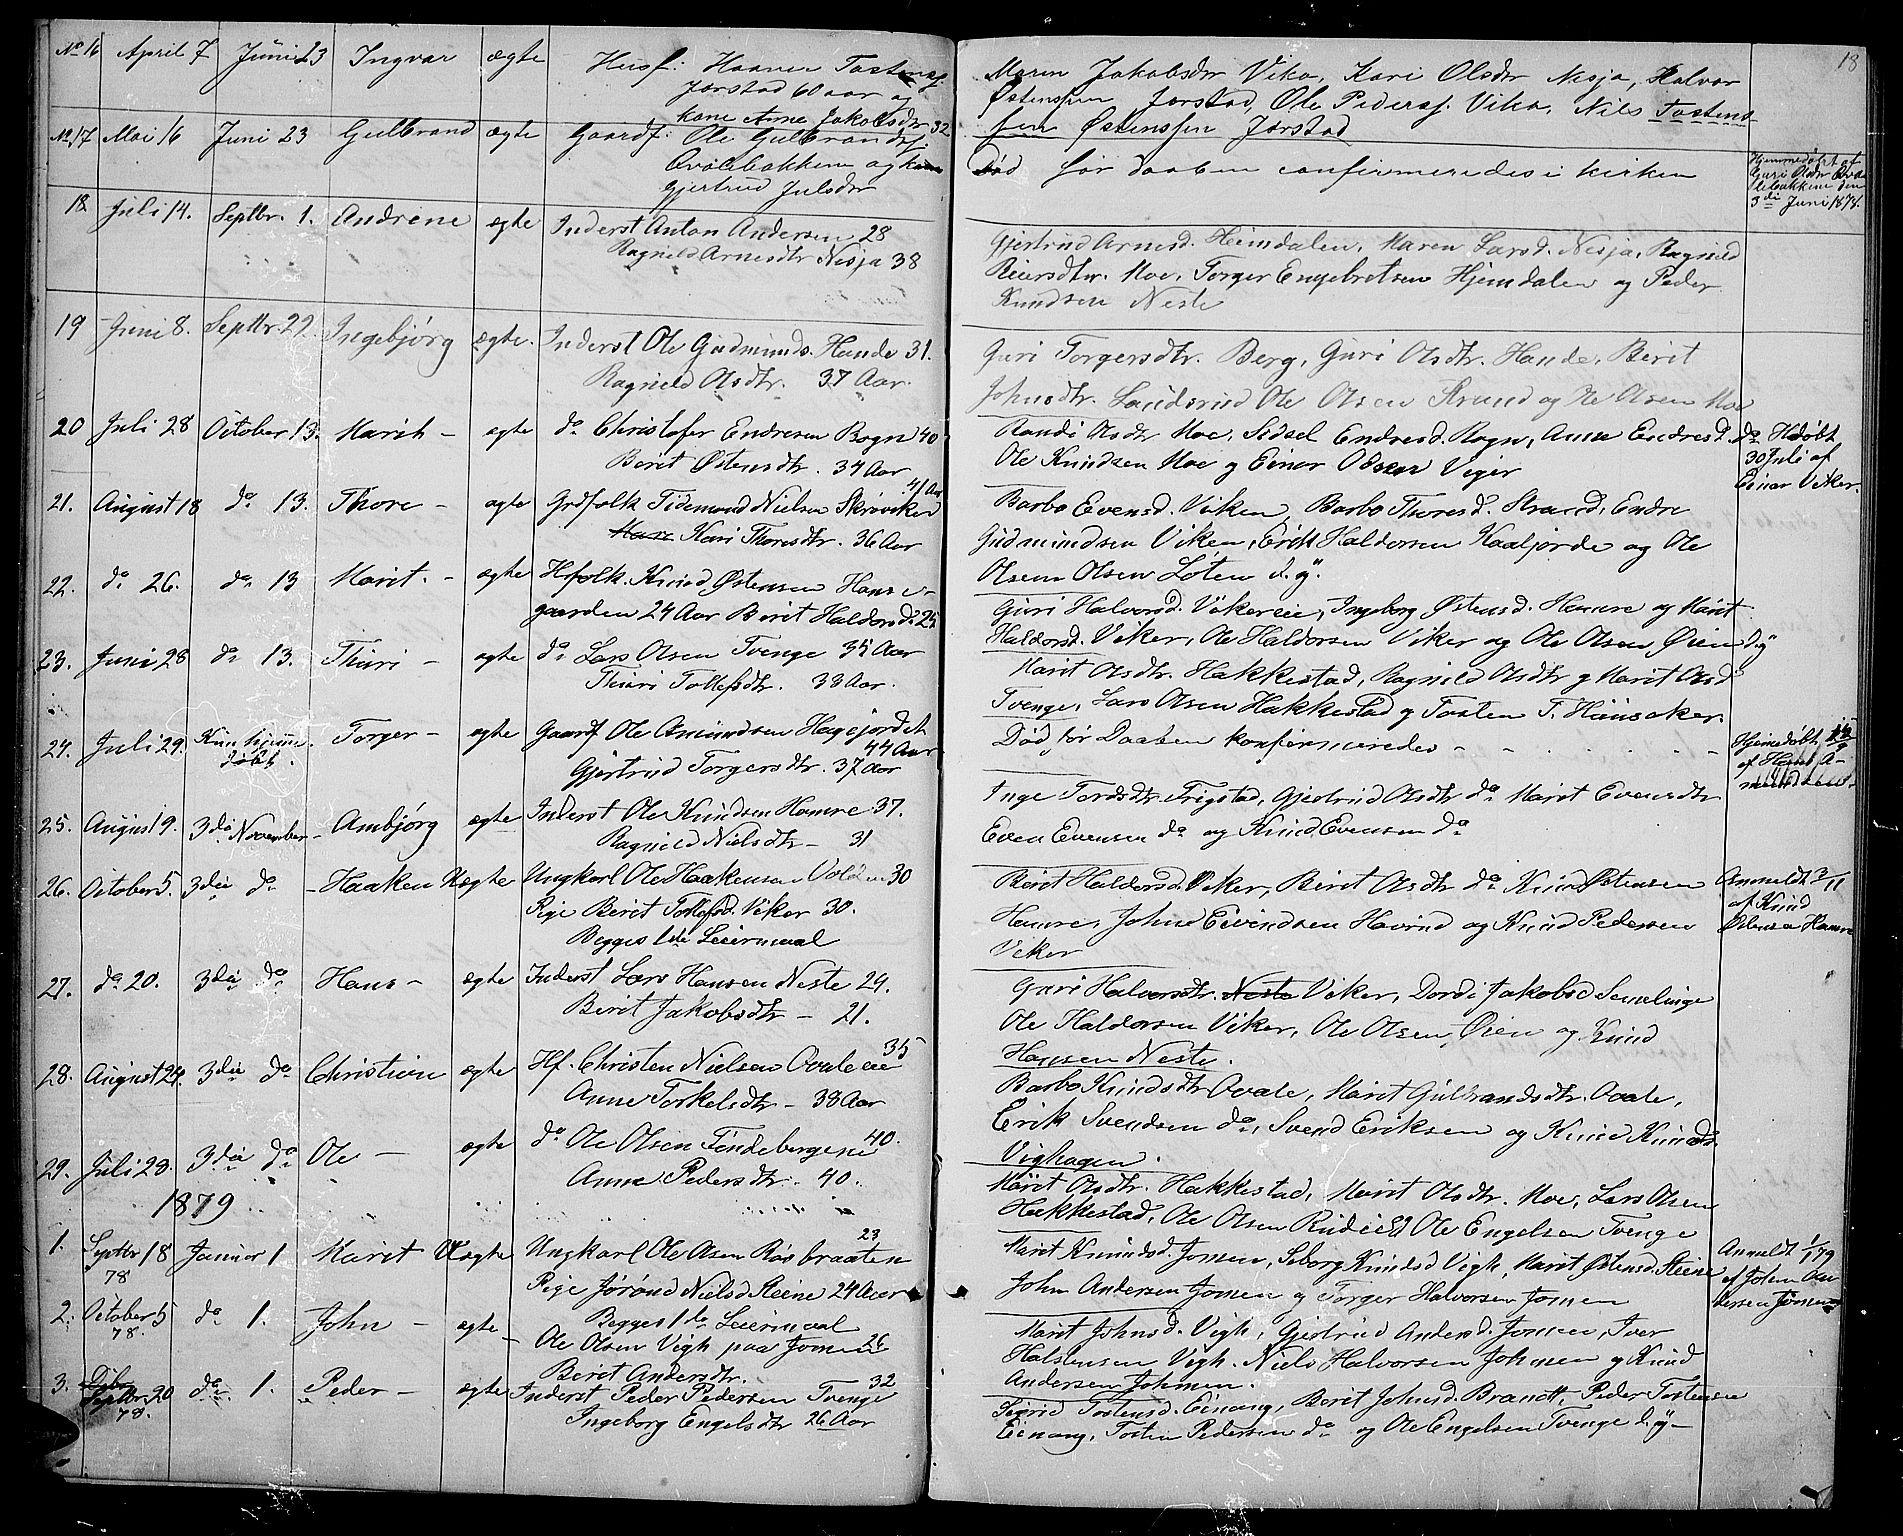 SAH, Vestre Slidre prestekontor, Klokkerbok nr. 1, 1869-1882, s. 18